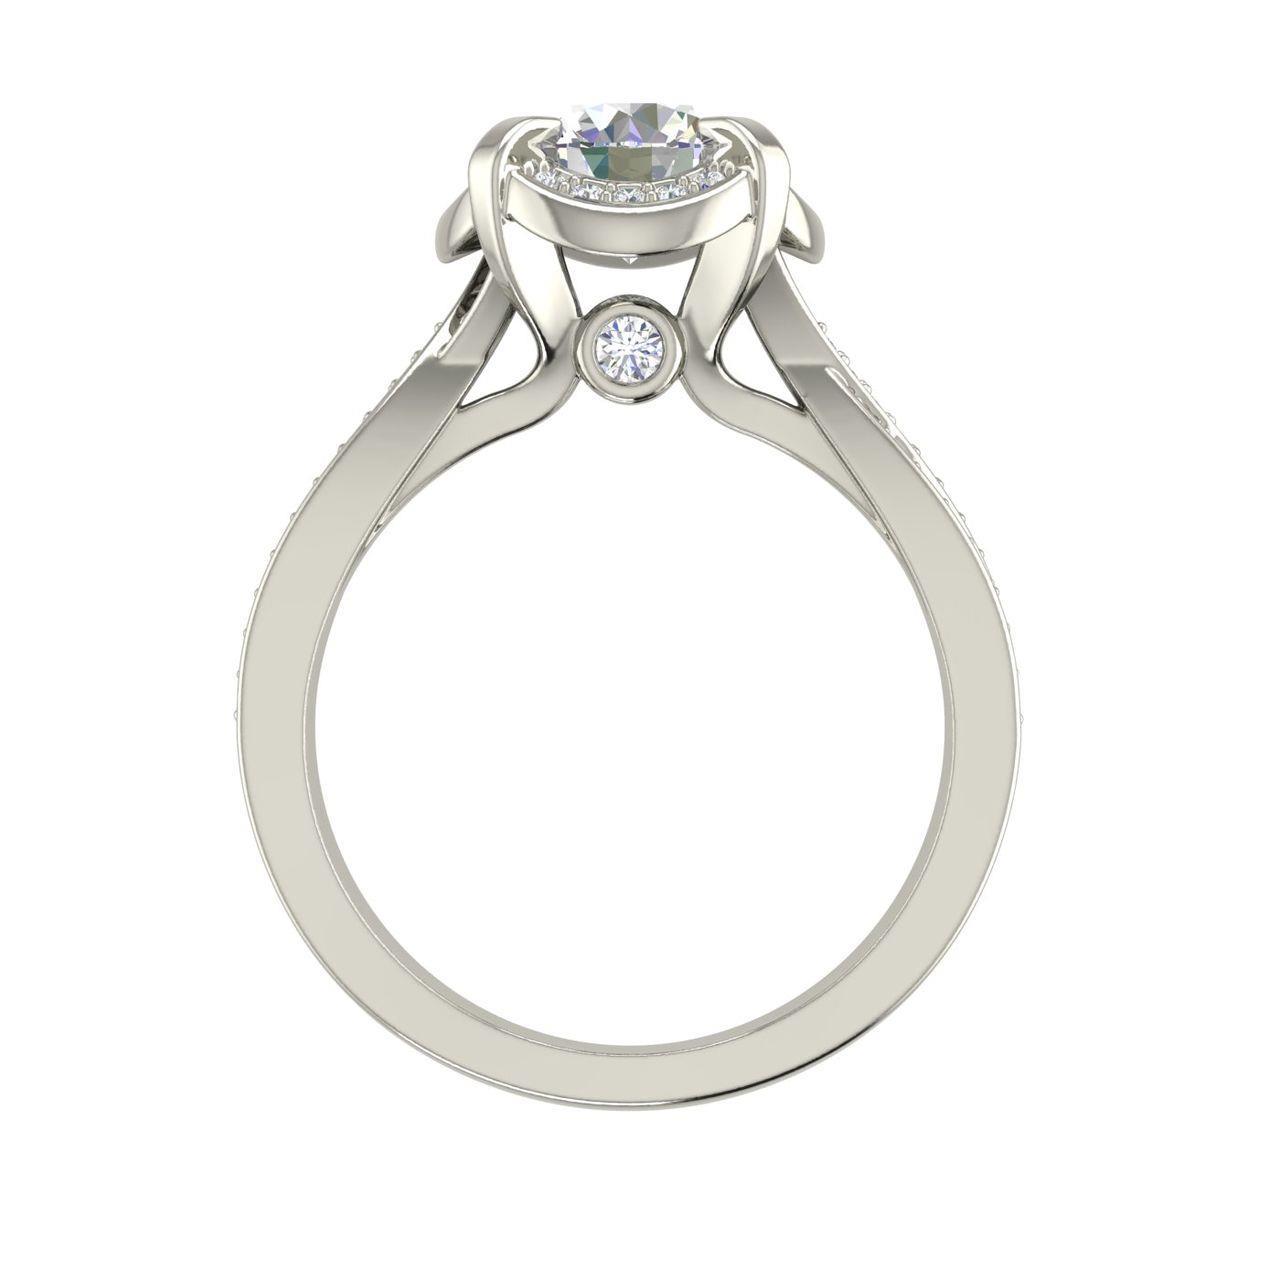 Twisted Halo 1.65 Carat Round Cut Diamond Engagement Ring